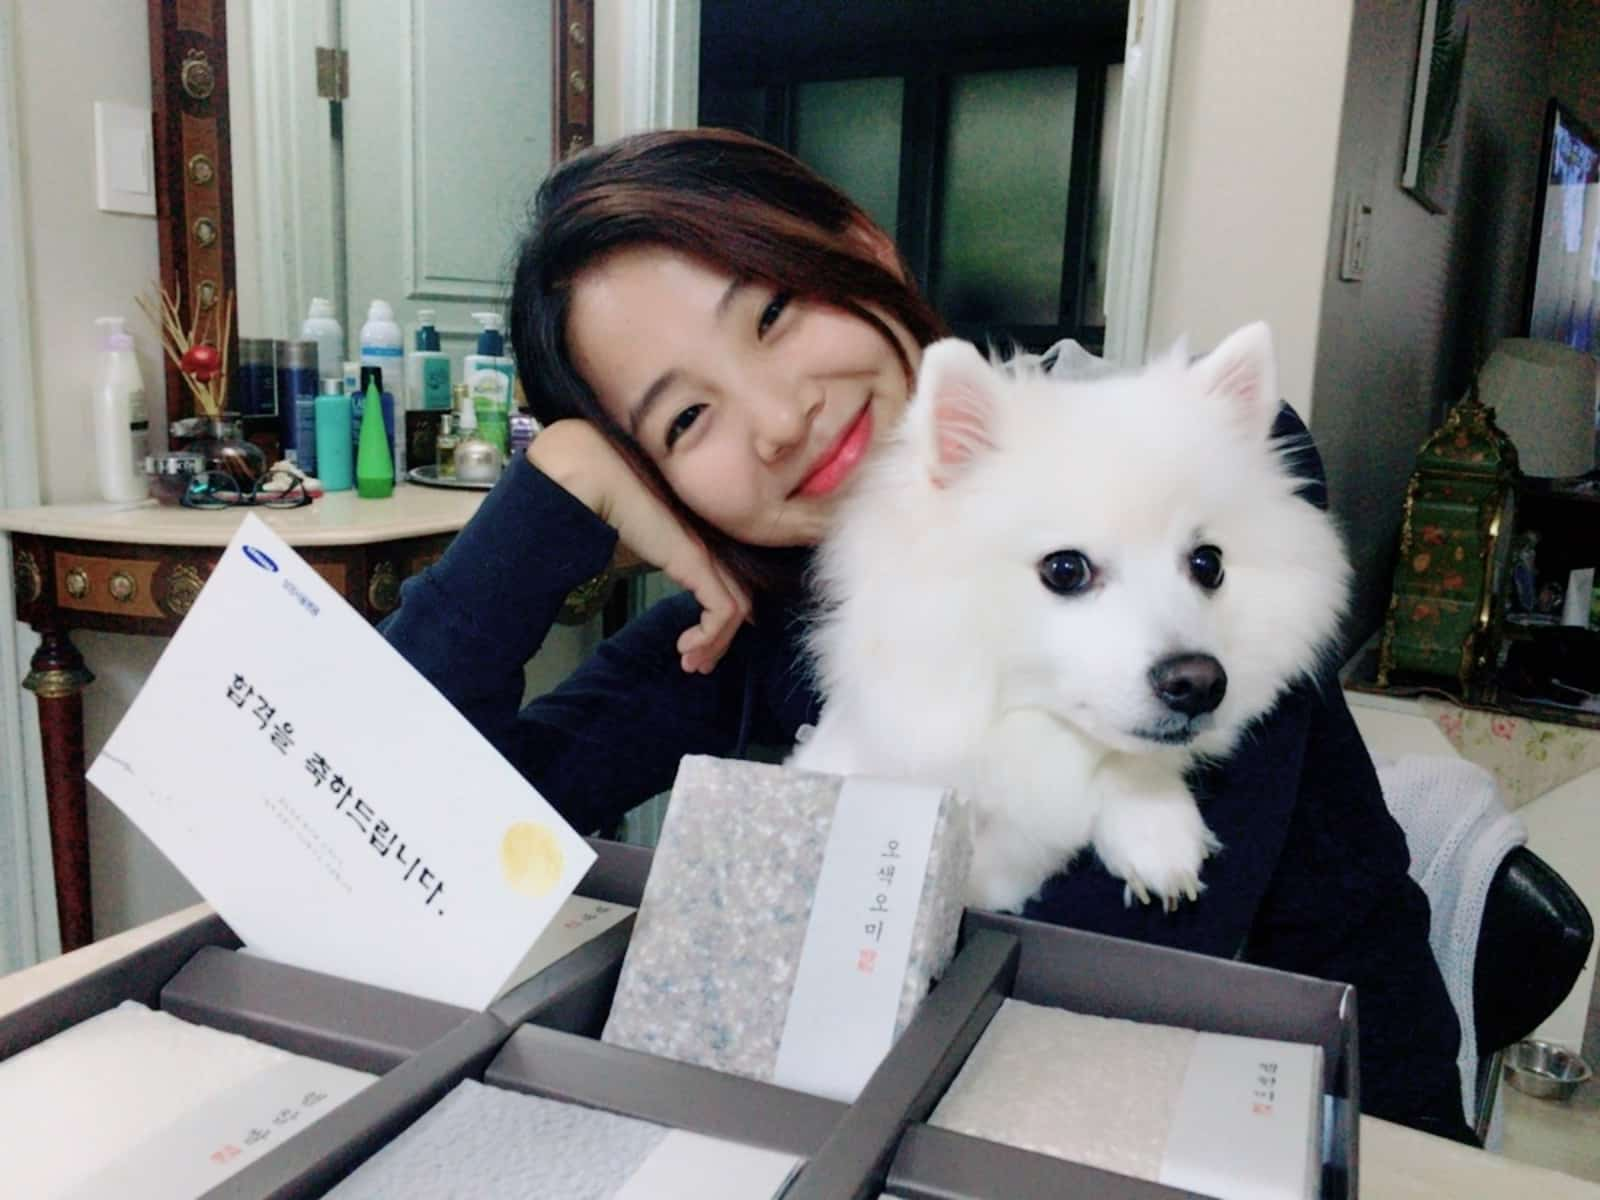 Jung min & Hyun mi lee from Seoul, South Korea